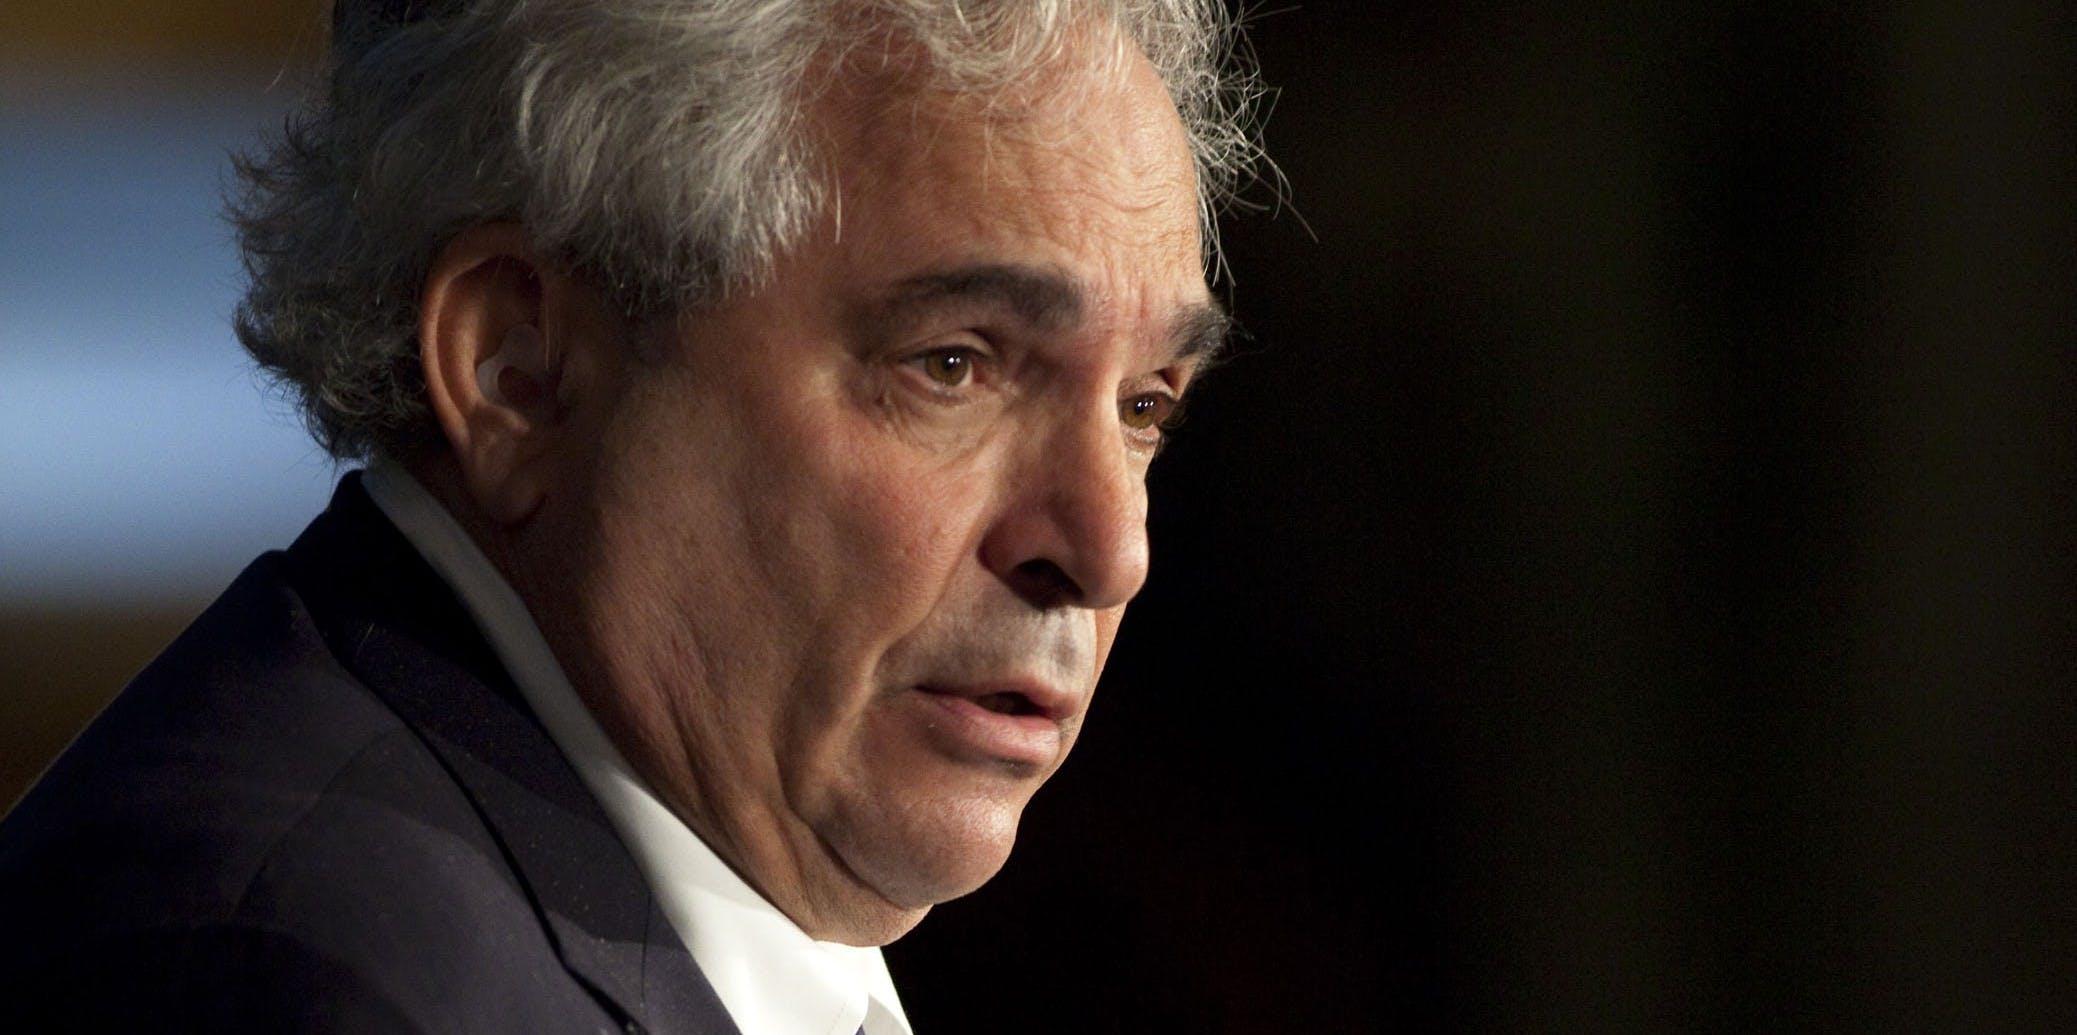 A Harvard Professor Filed a Shareholder Lawsuit to Restrict Shareholder Rights